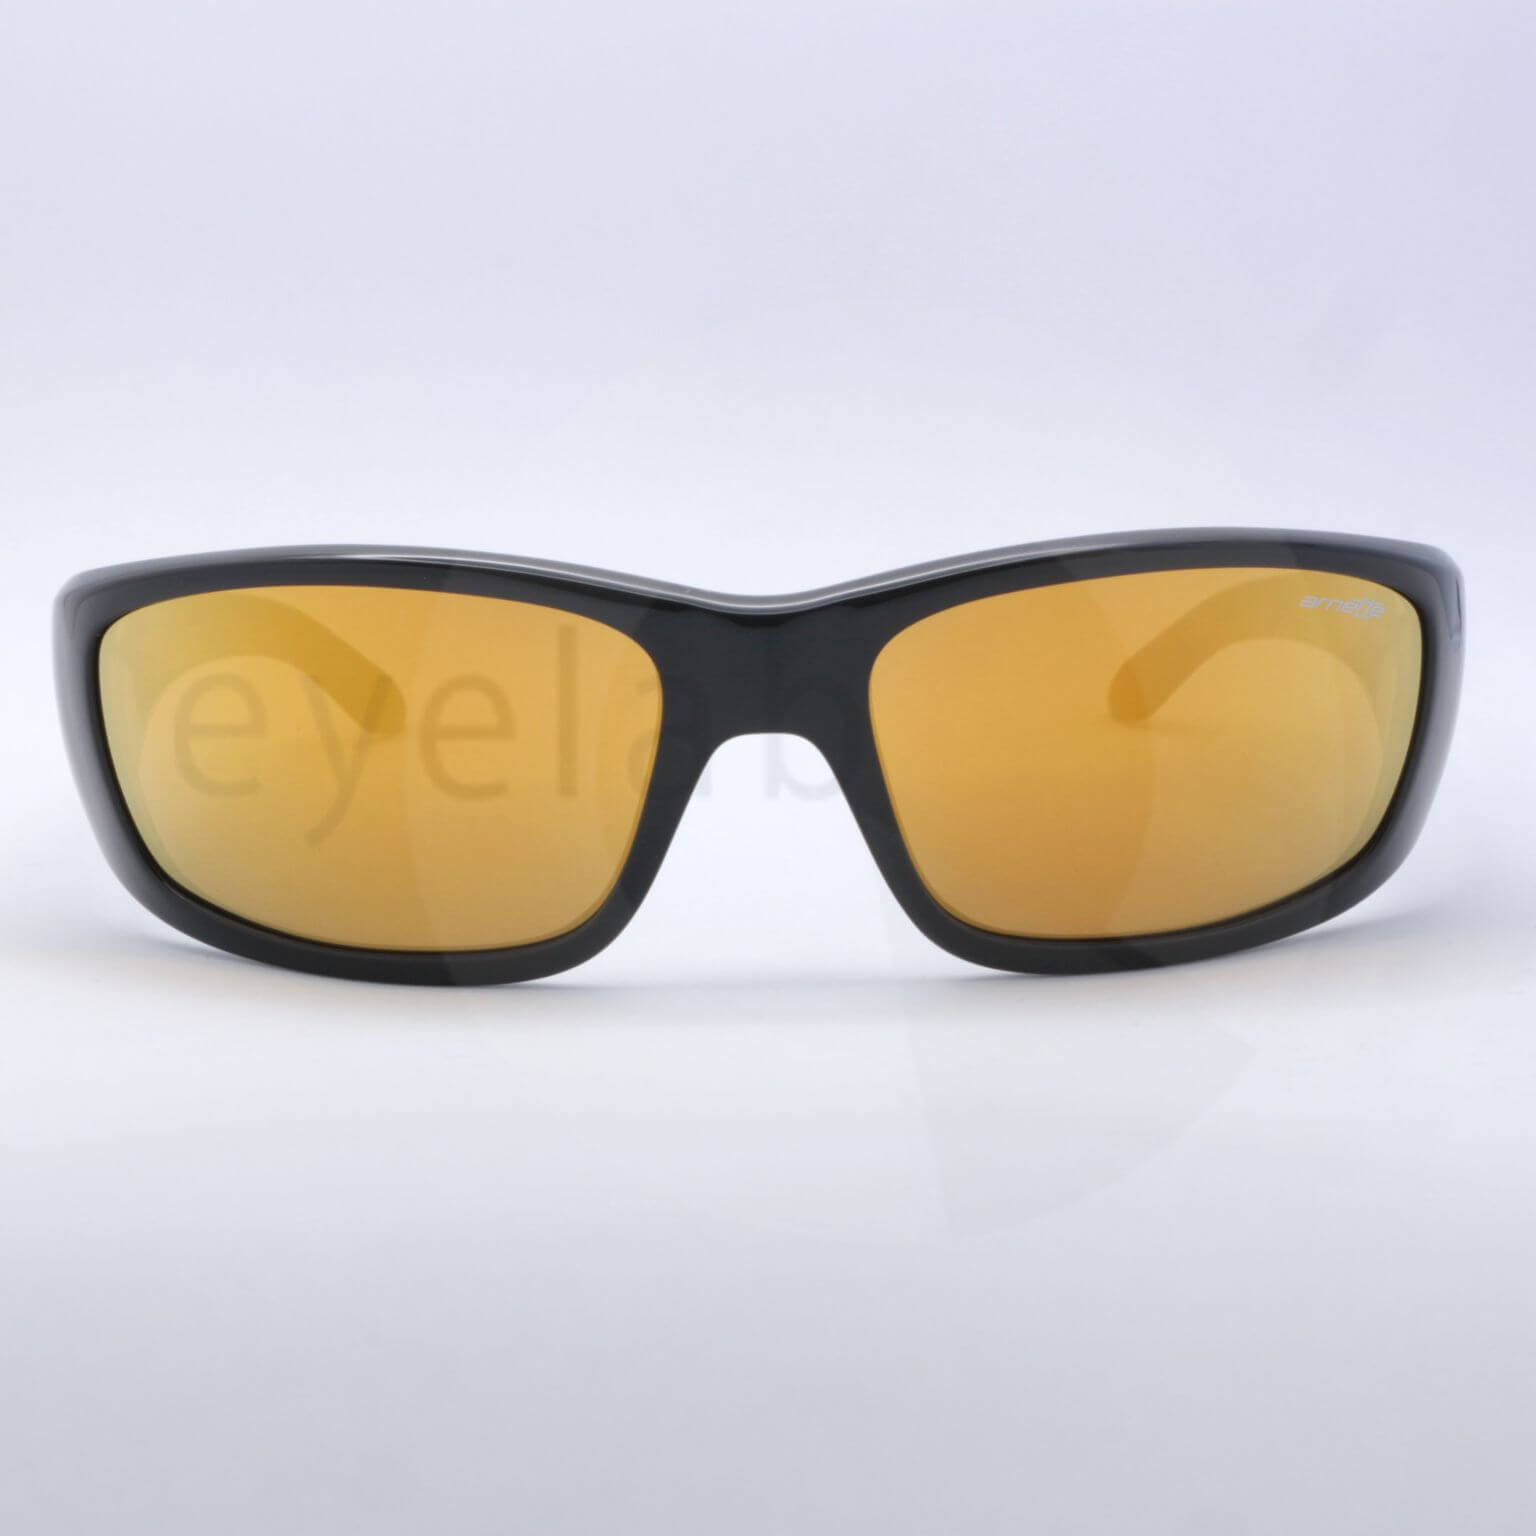 234ed79795 Arnette Quick Draw 4178 2594N0 sunglasses ~ Οπτικά Eyelab